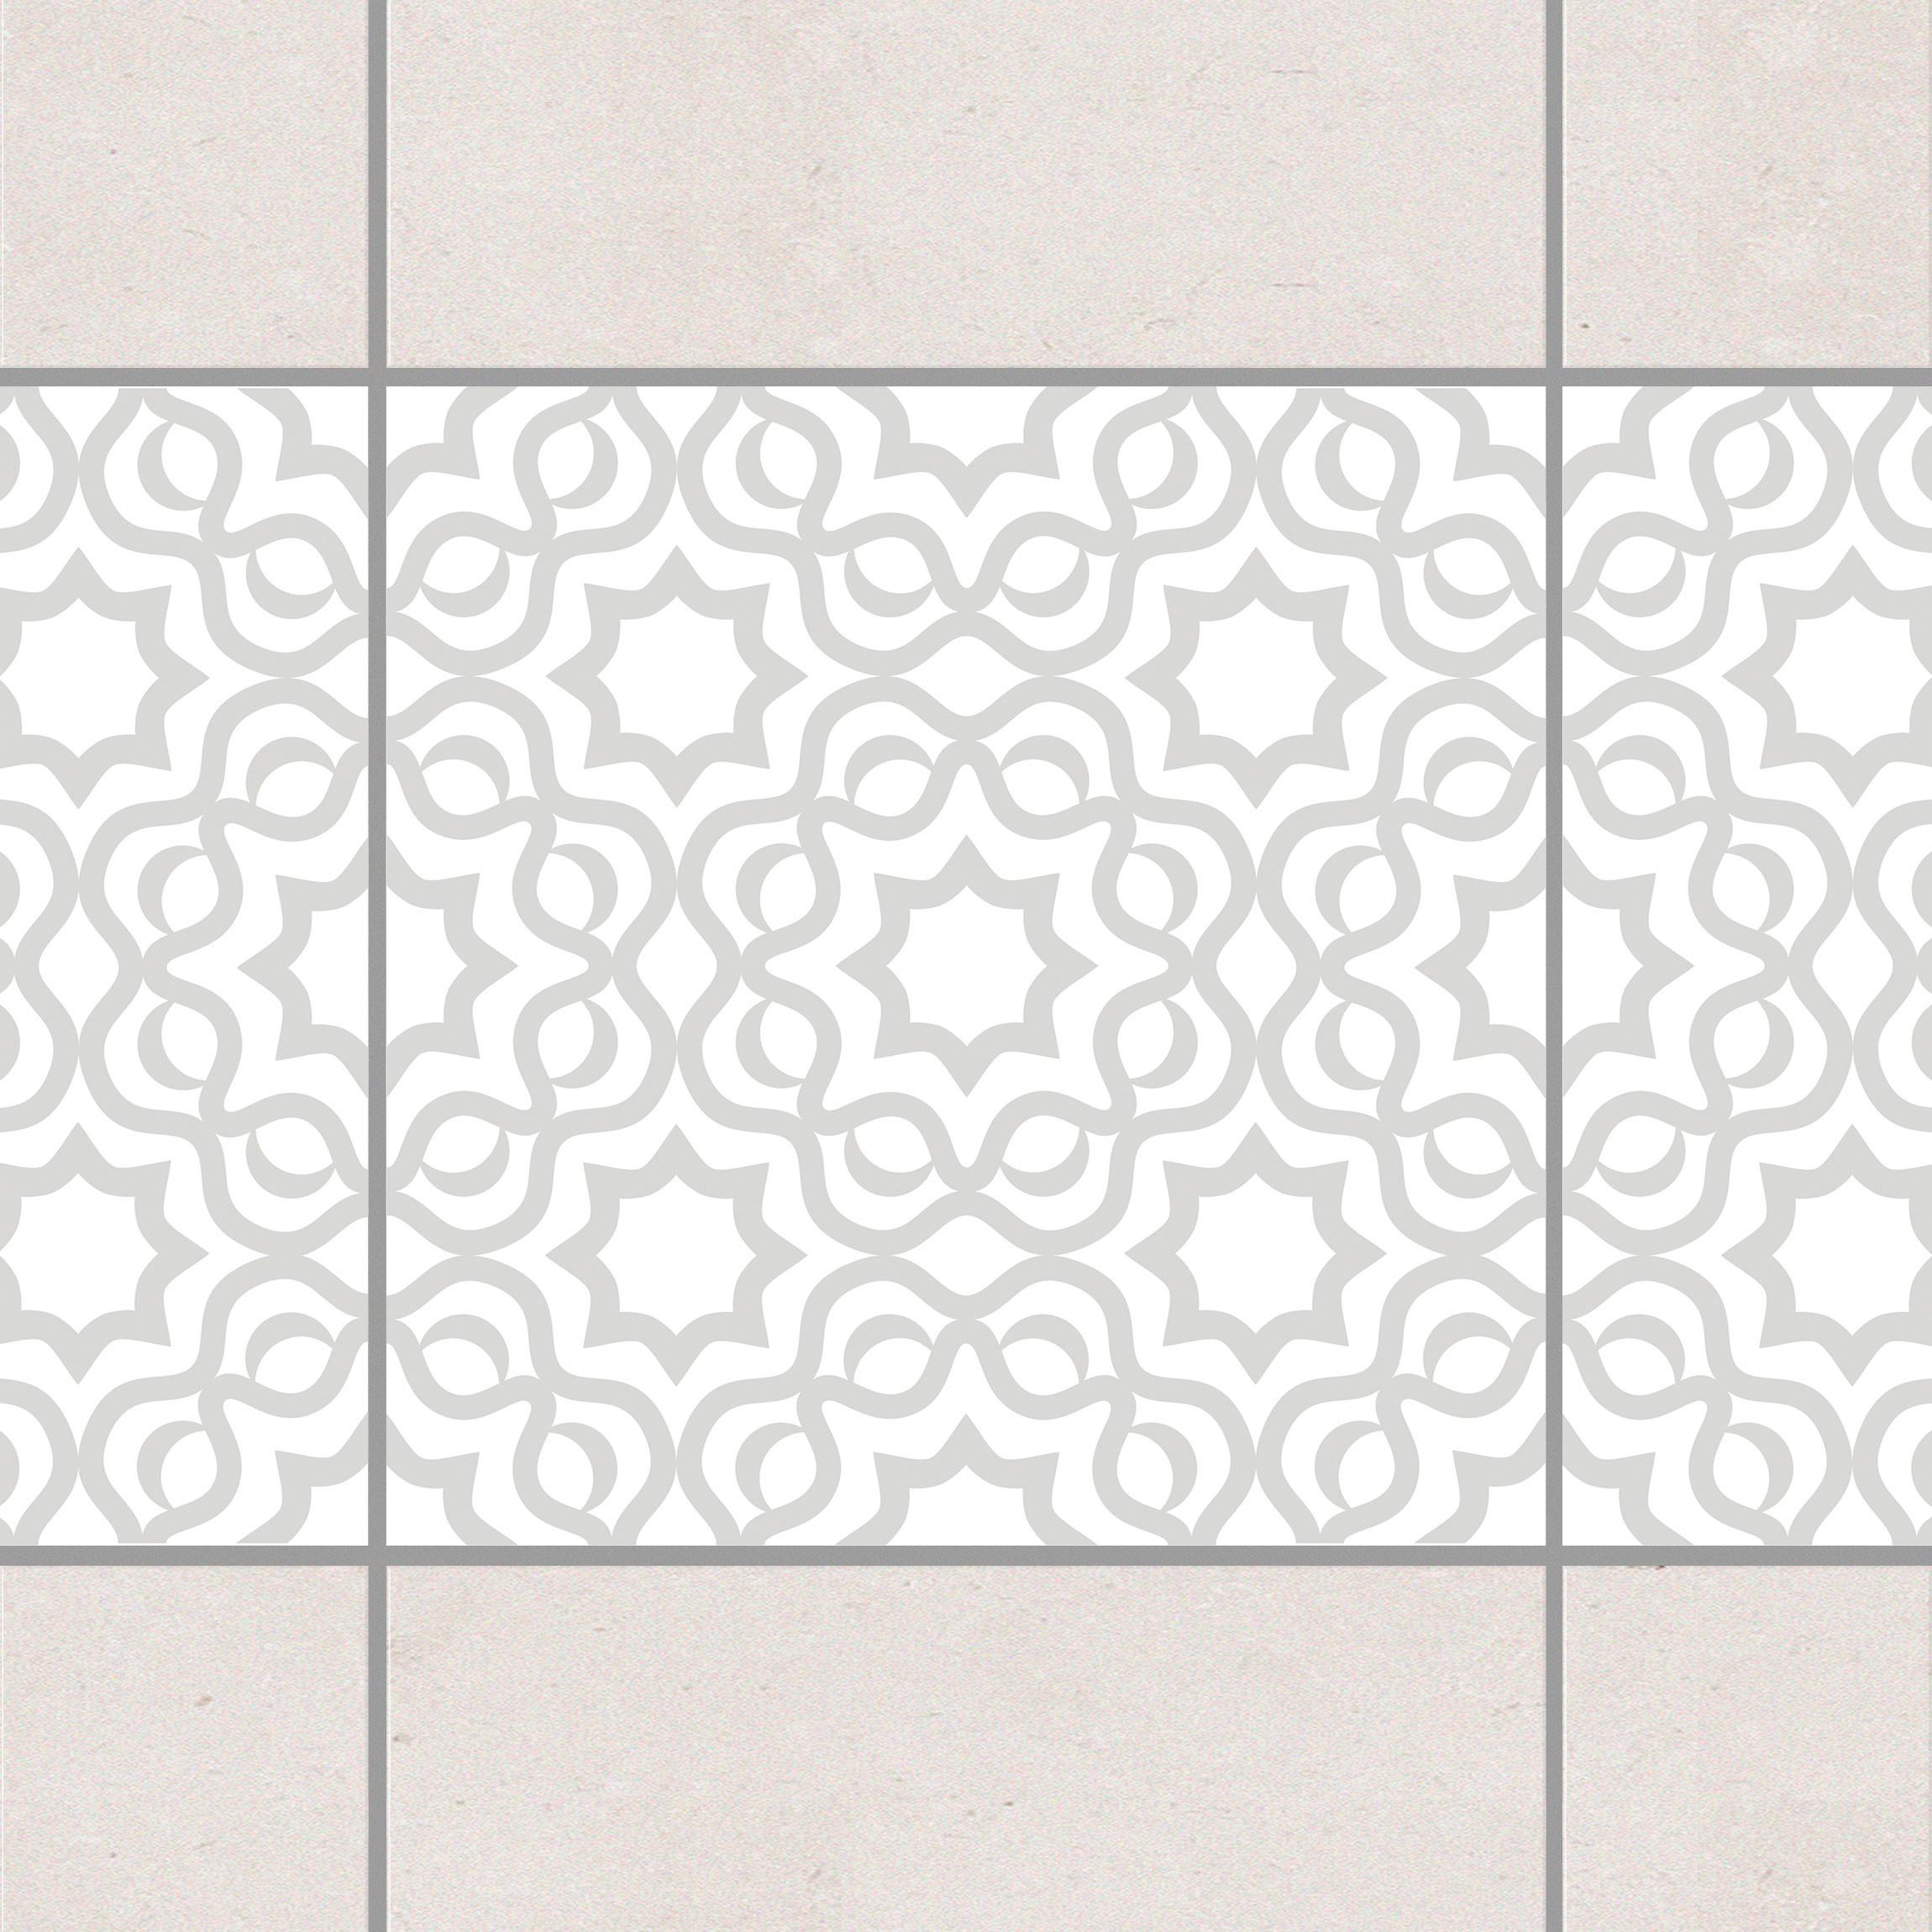 fliesen bord re islamic white light grey 10x10 cm fliesenaufkleber grau. Black Bedroom Furniture Sets. Home Design Ideas